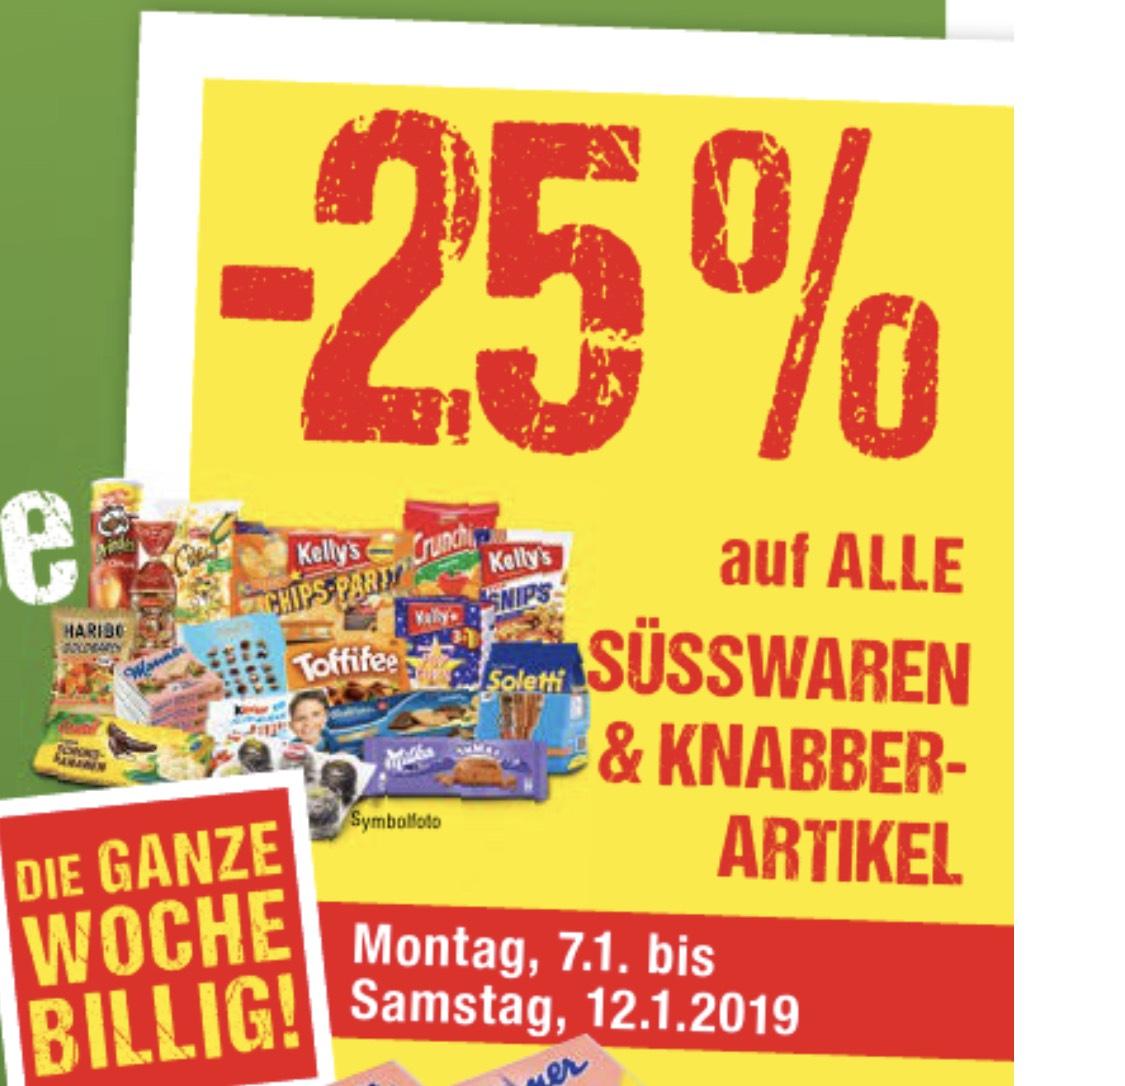 [Maximarkt] -25% auf alle Süsswaren & Knabberartikel